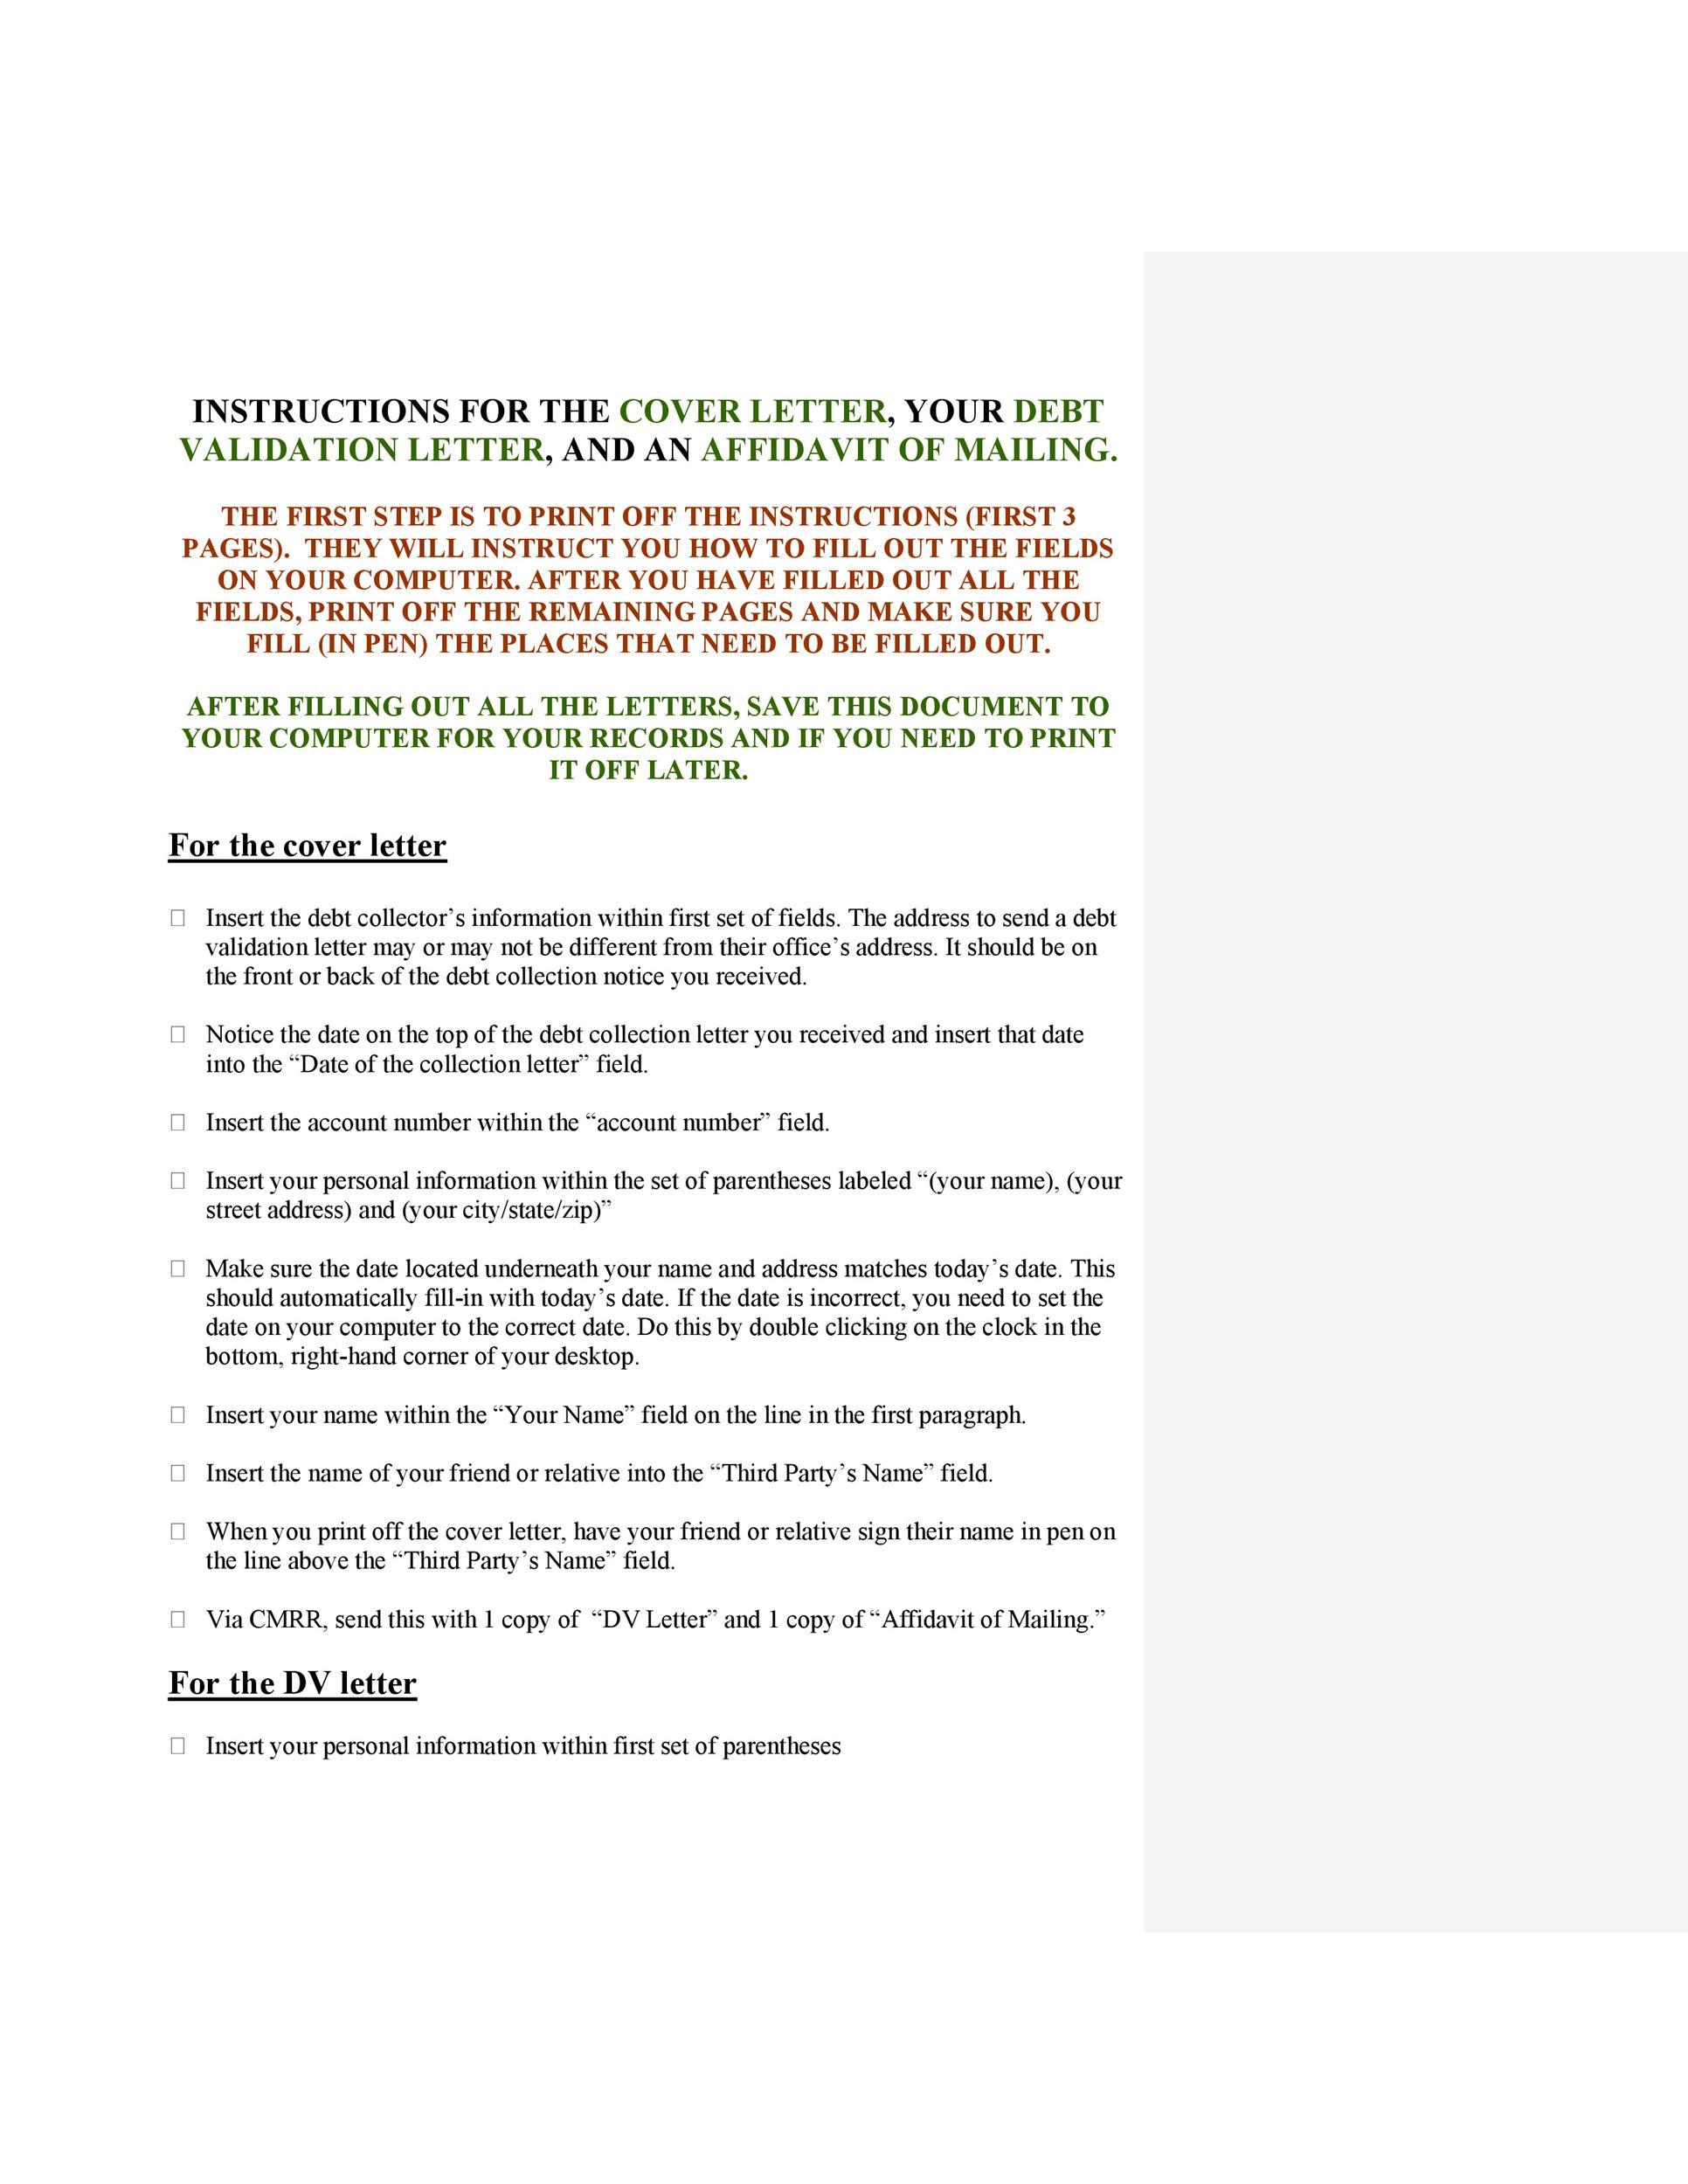 Free debt validation letter 24